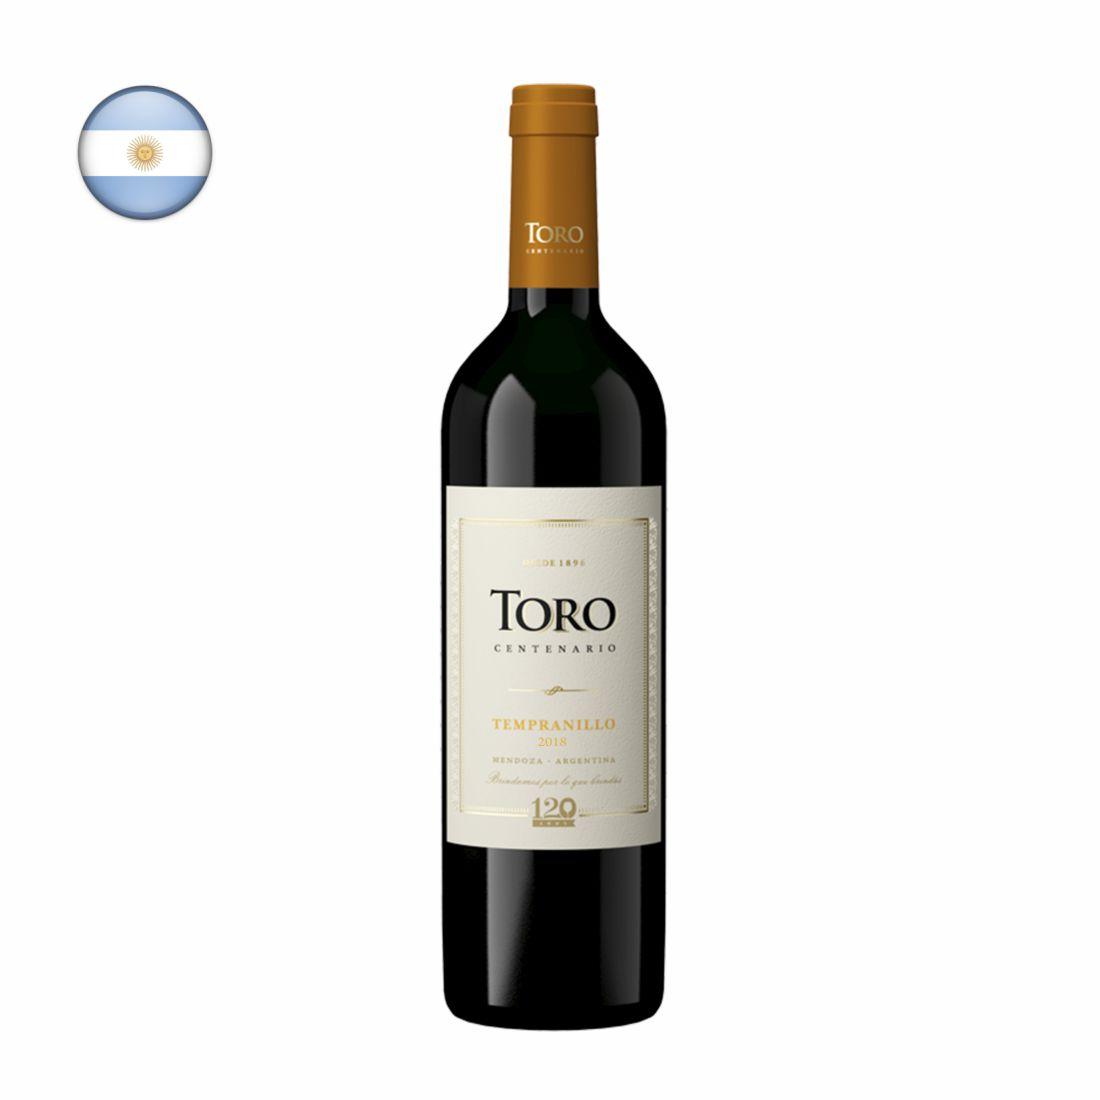 VINHO ARGENTINO TORO 750ML TEMPRANILLO